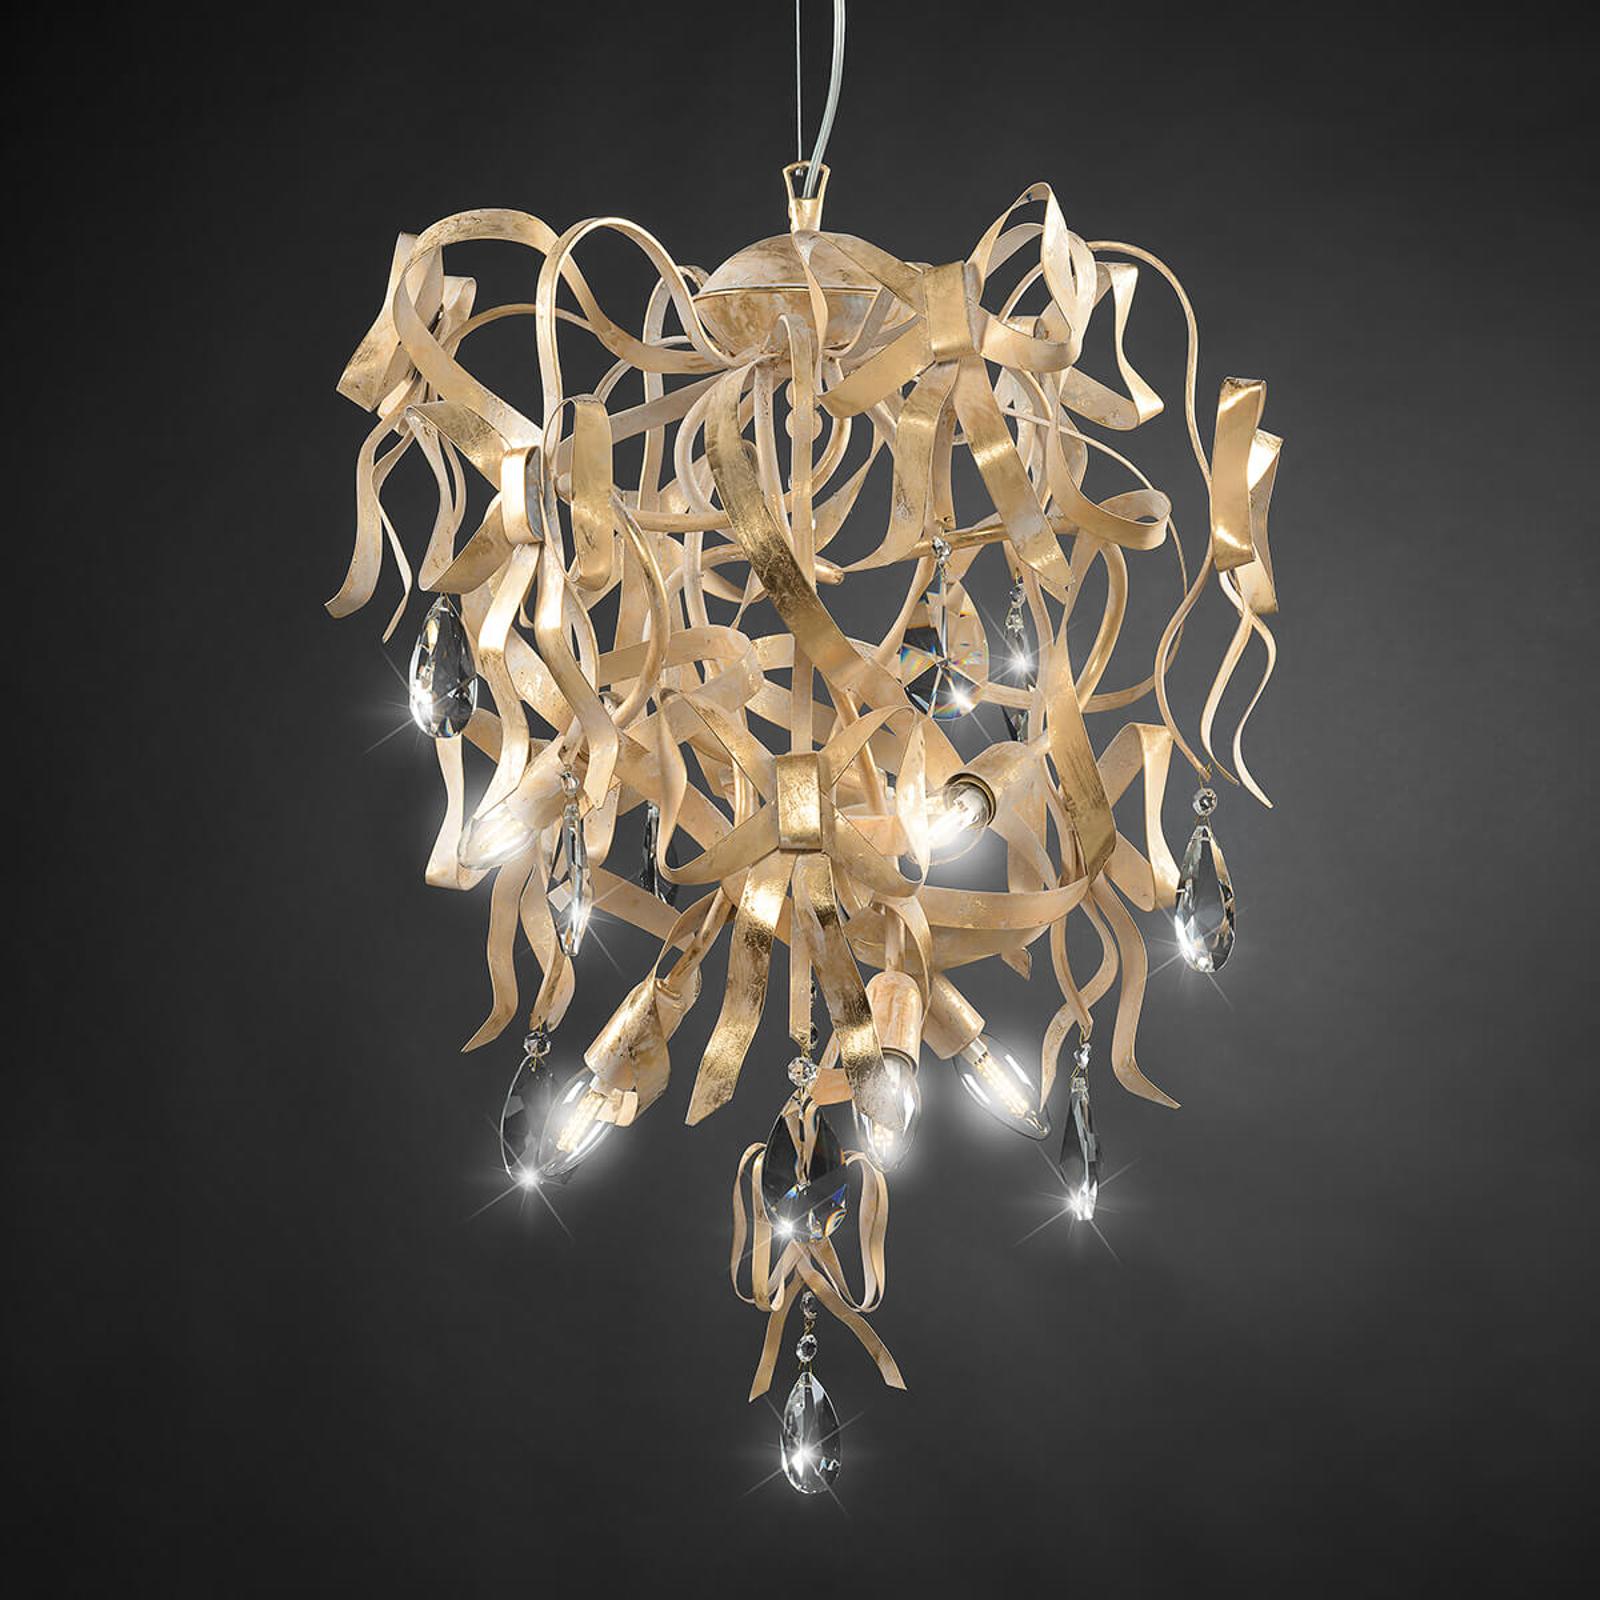 Design hanglamp Greta met goud patina